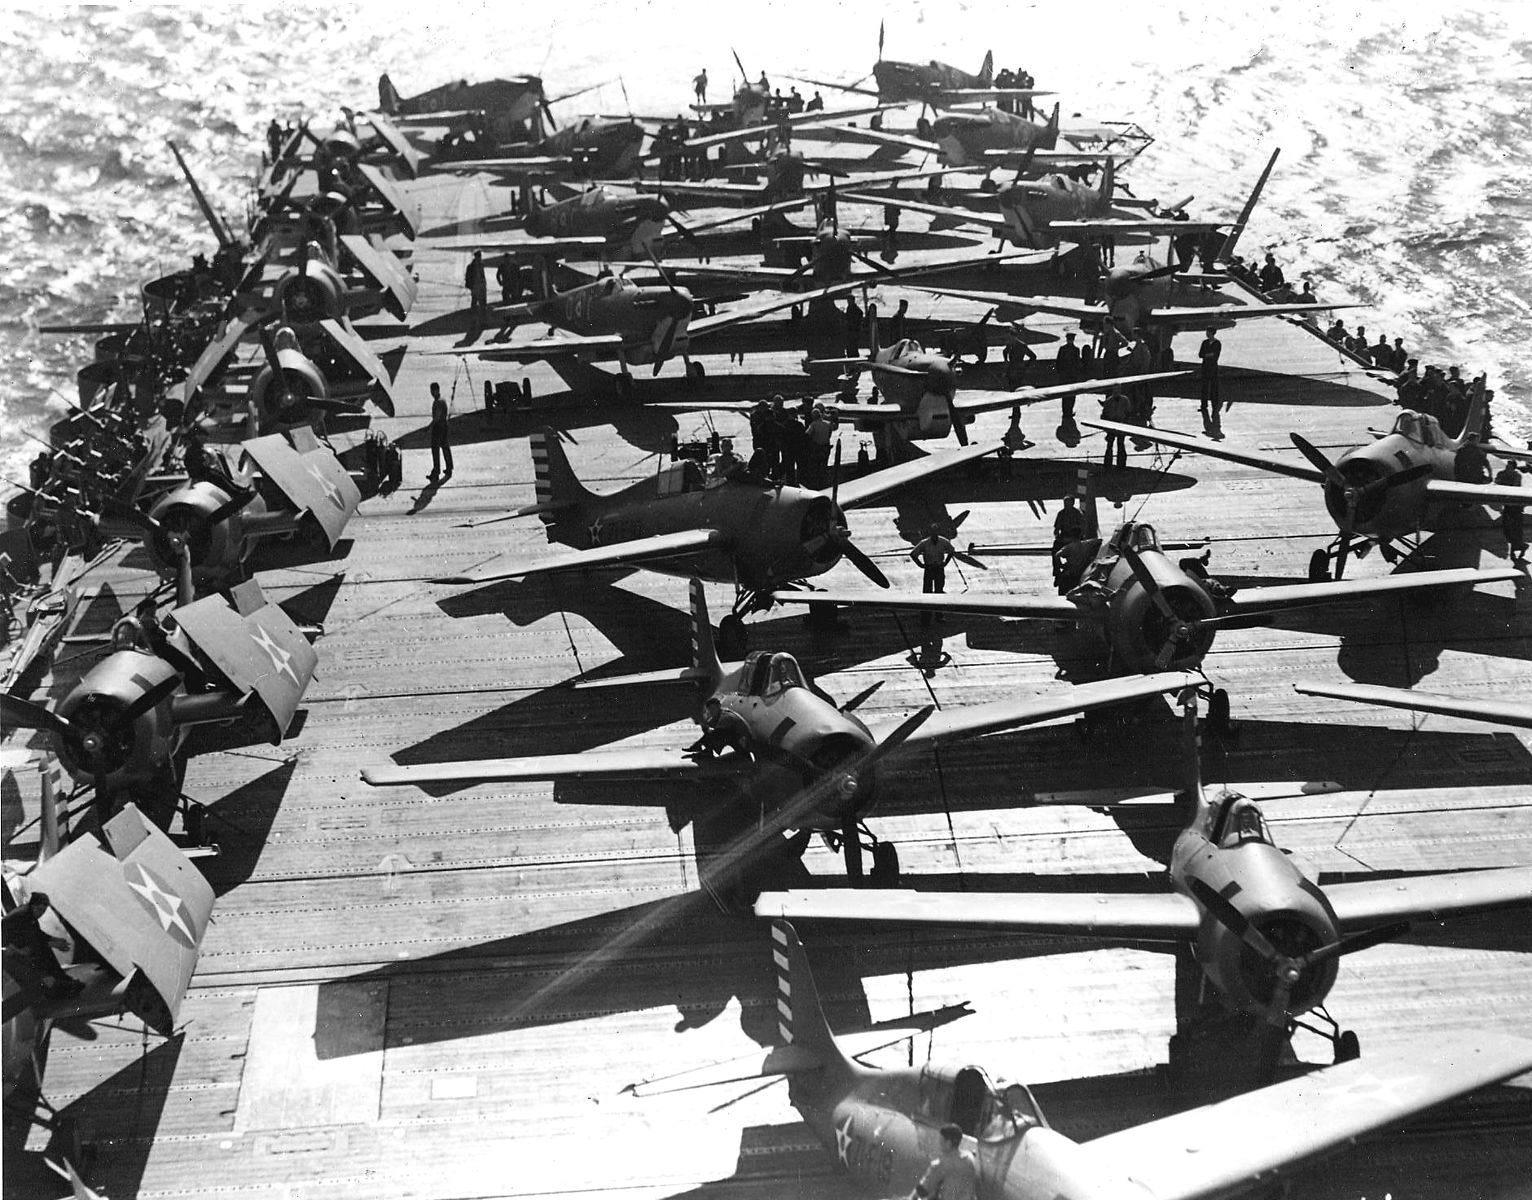 Wildcats and Spitfires on USS Wasp (CV 7) in April 1942 - Des F4F-4 Wildcat du Fighting Squadron 71 (VF-71) et des Supermarine Spitfire Mk.Vc de la RAF sur le porte-avions Wasp le 19 avril 1942